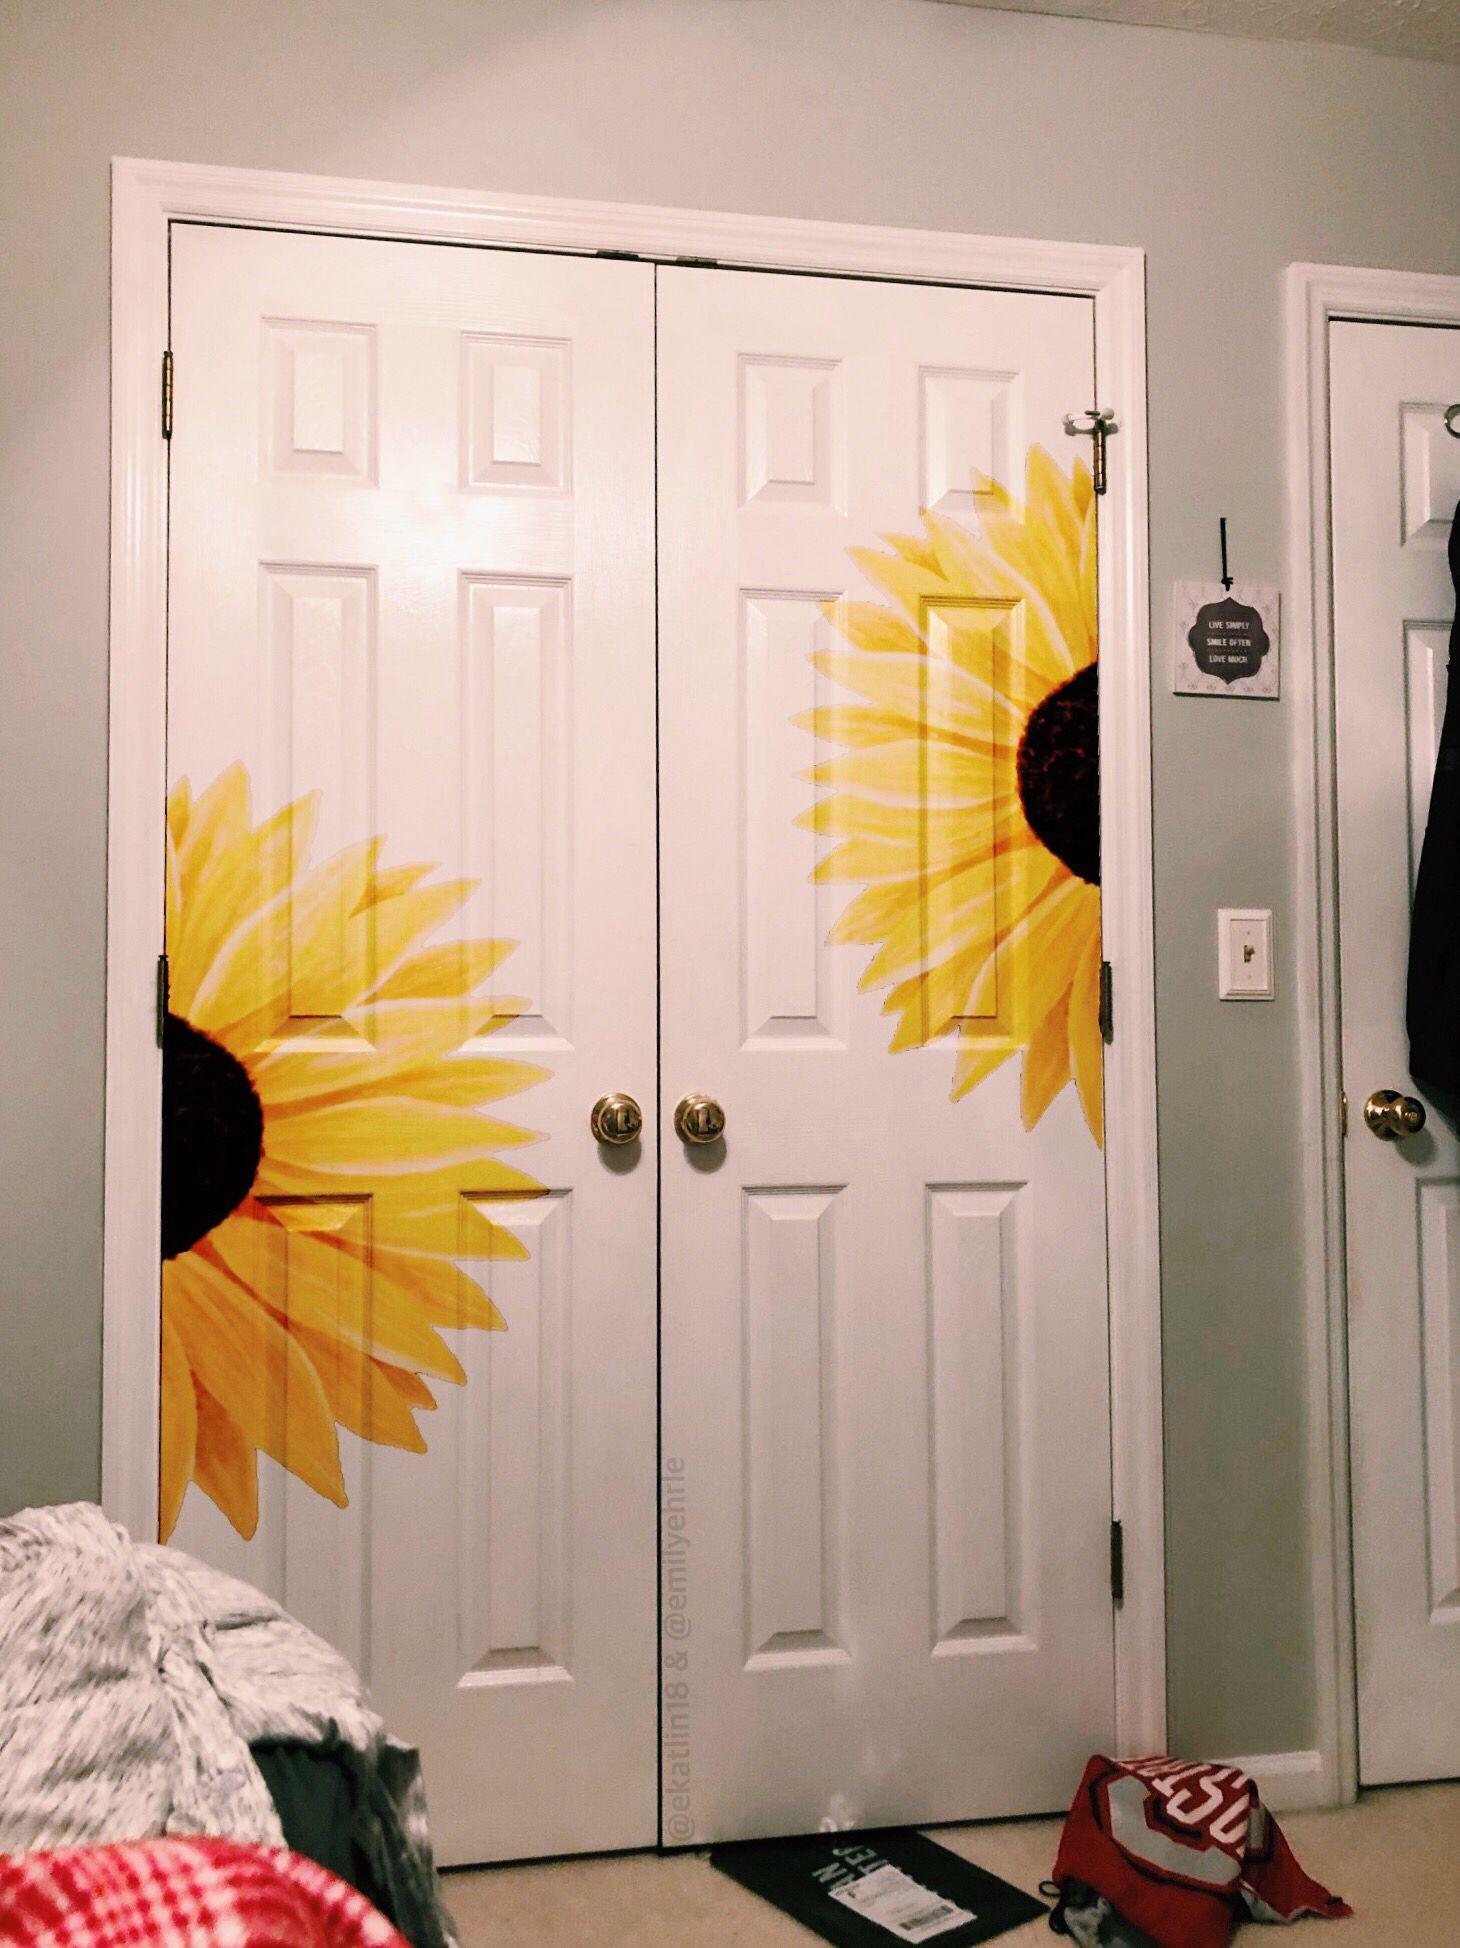 Pin By Kenna On Room Inspo Painted Bedroom Doors Bedroom